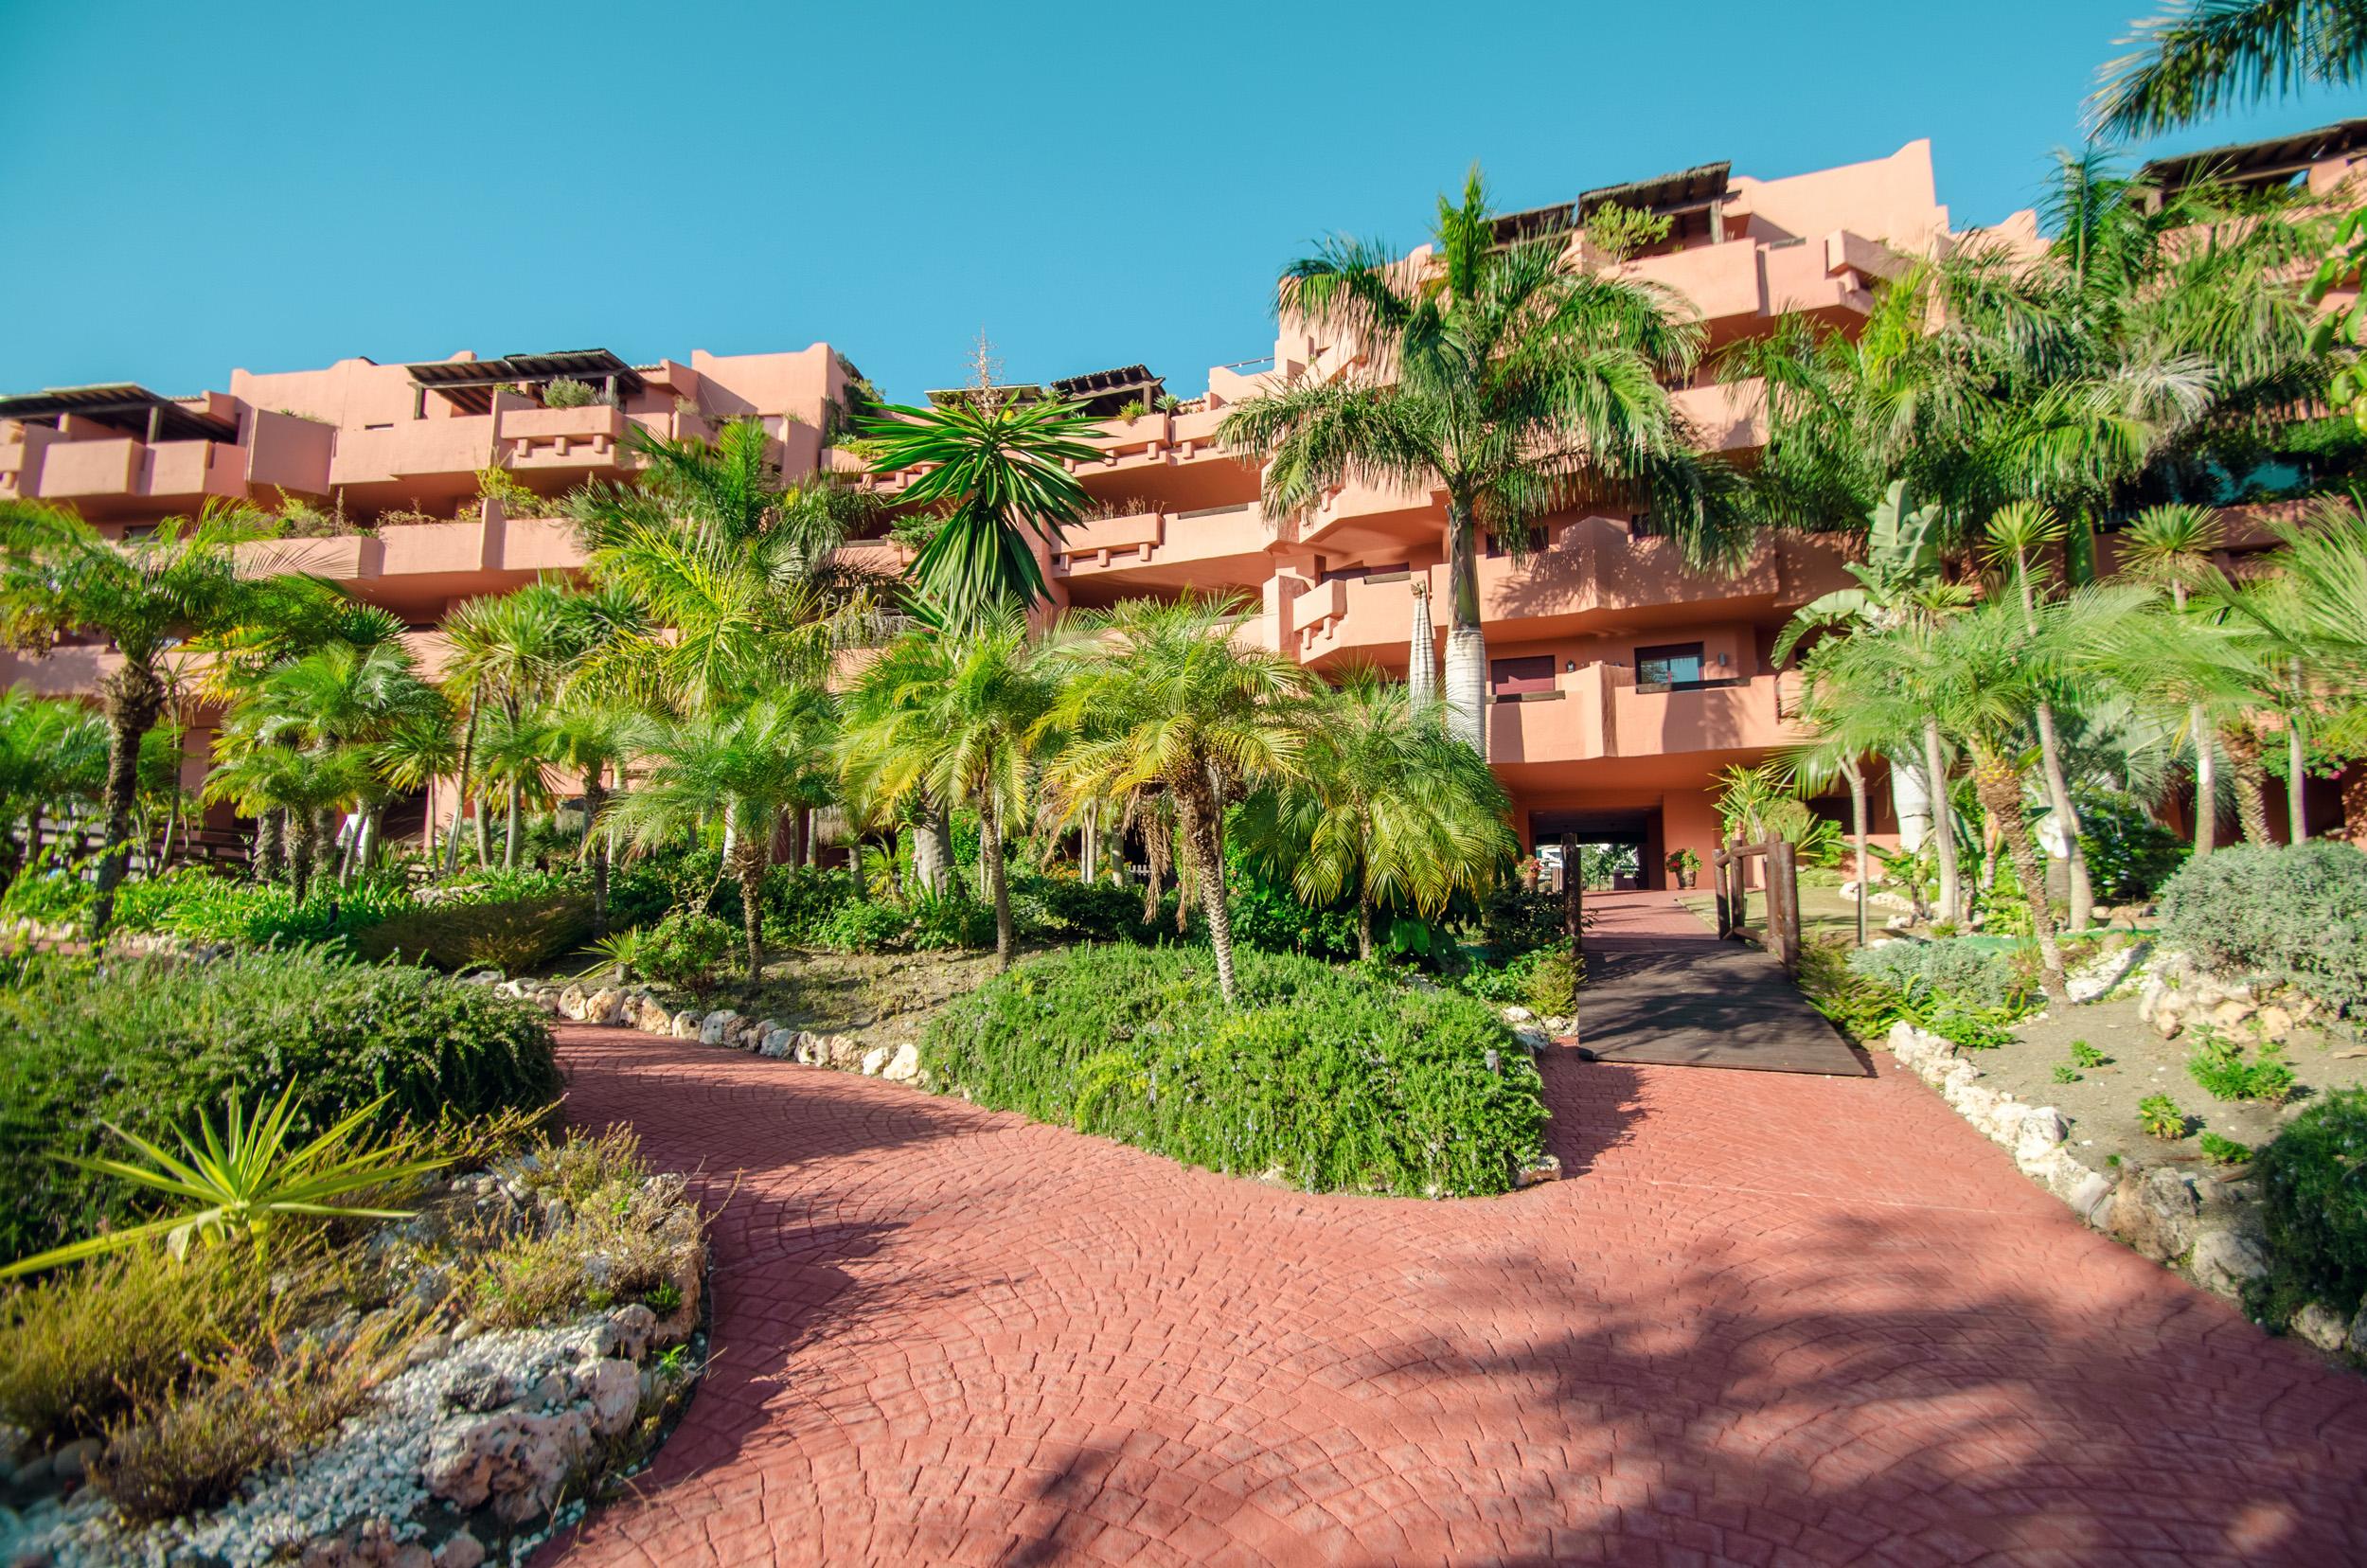 Beachfront urbanization in Estepona